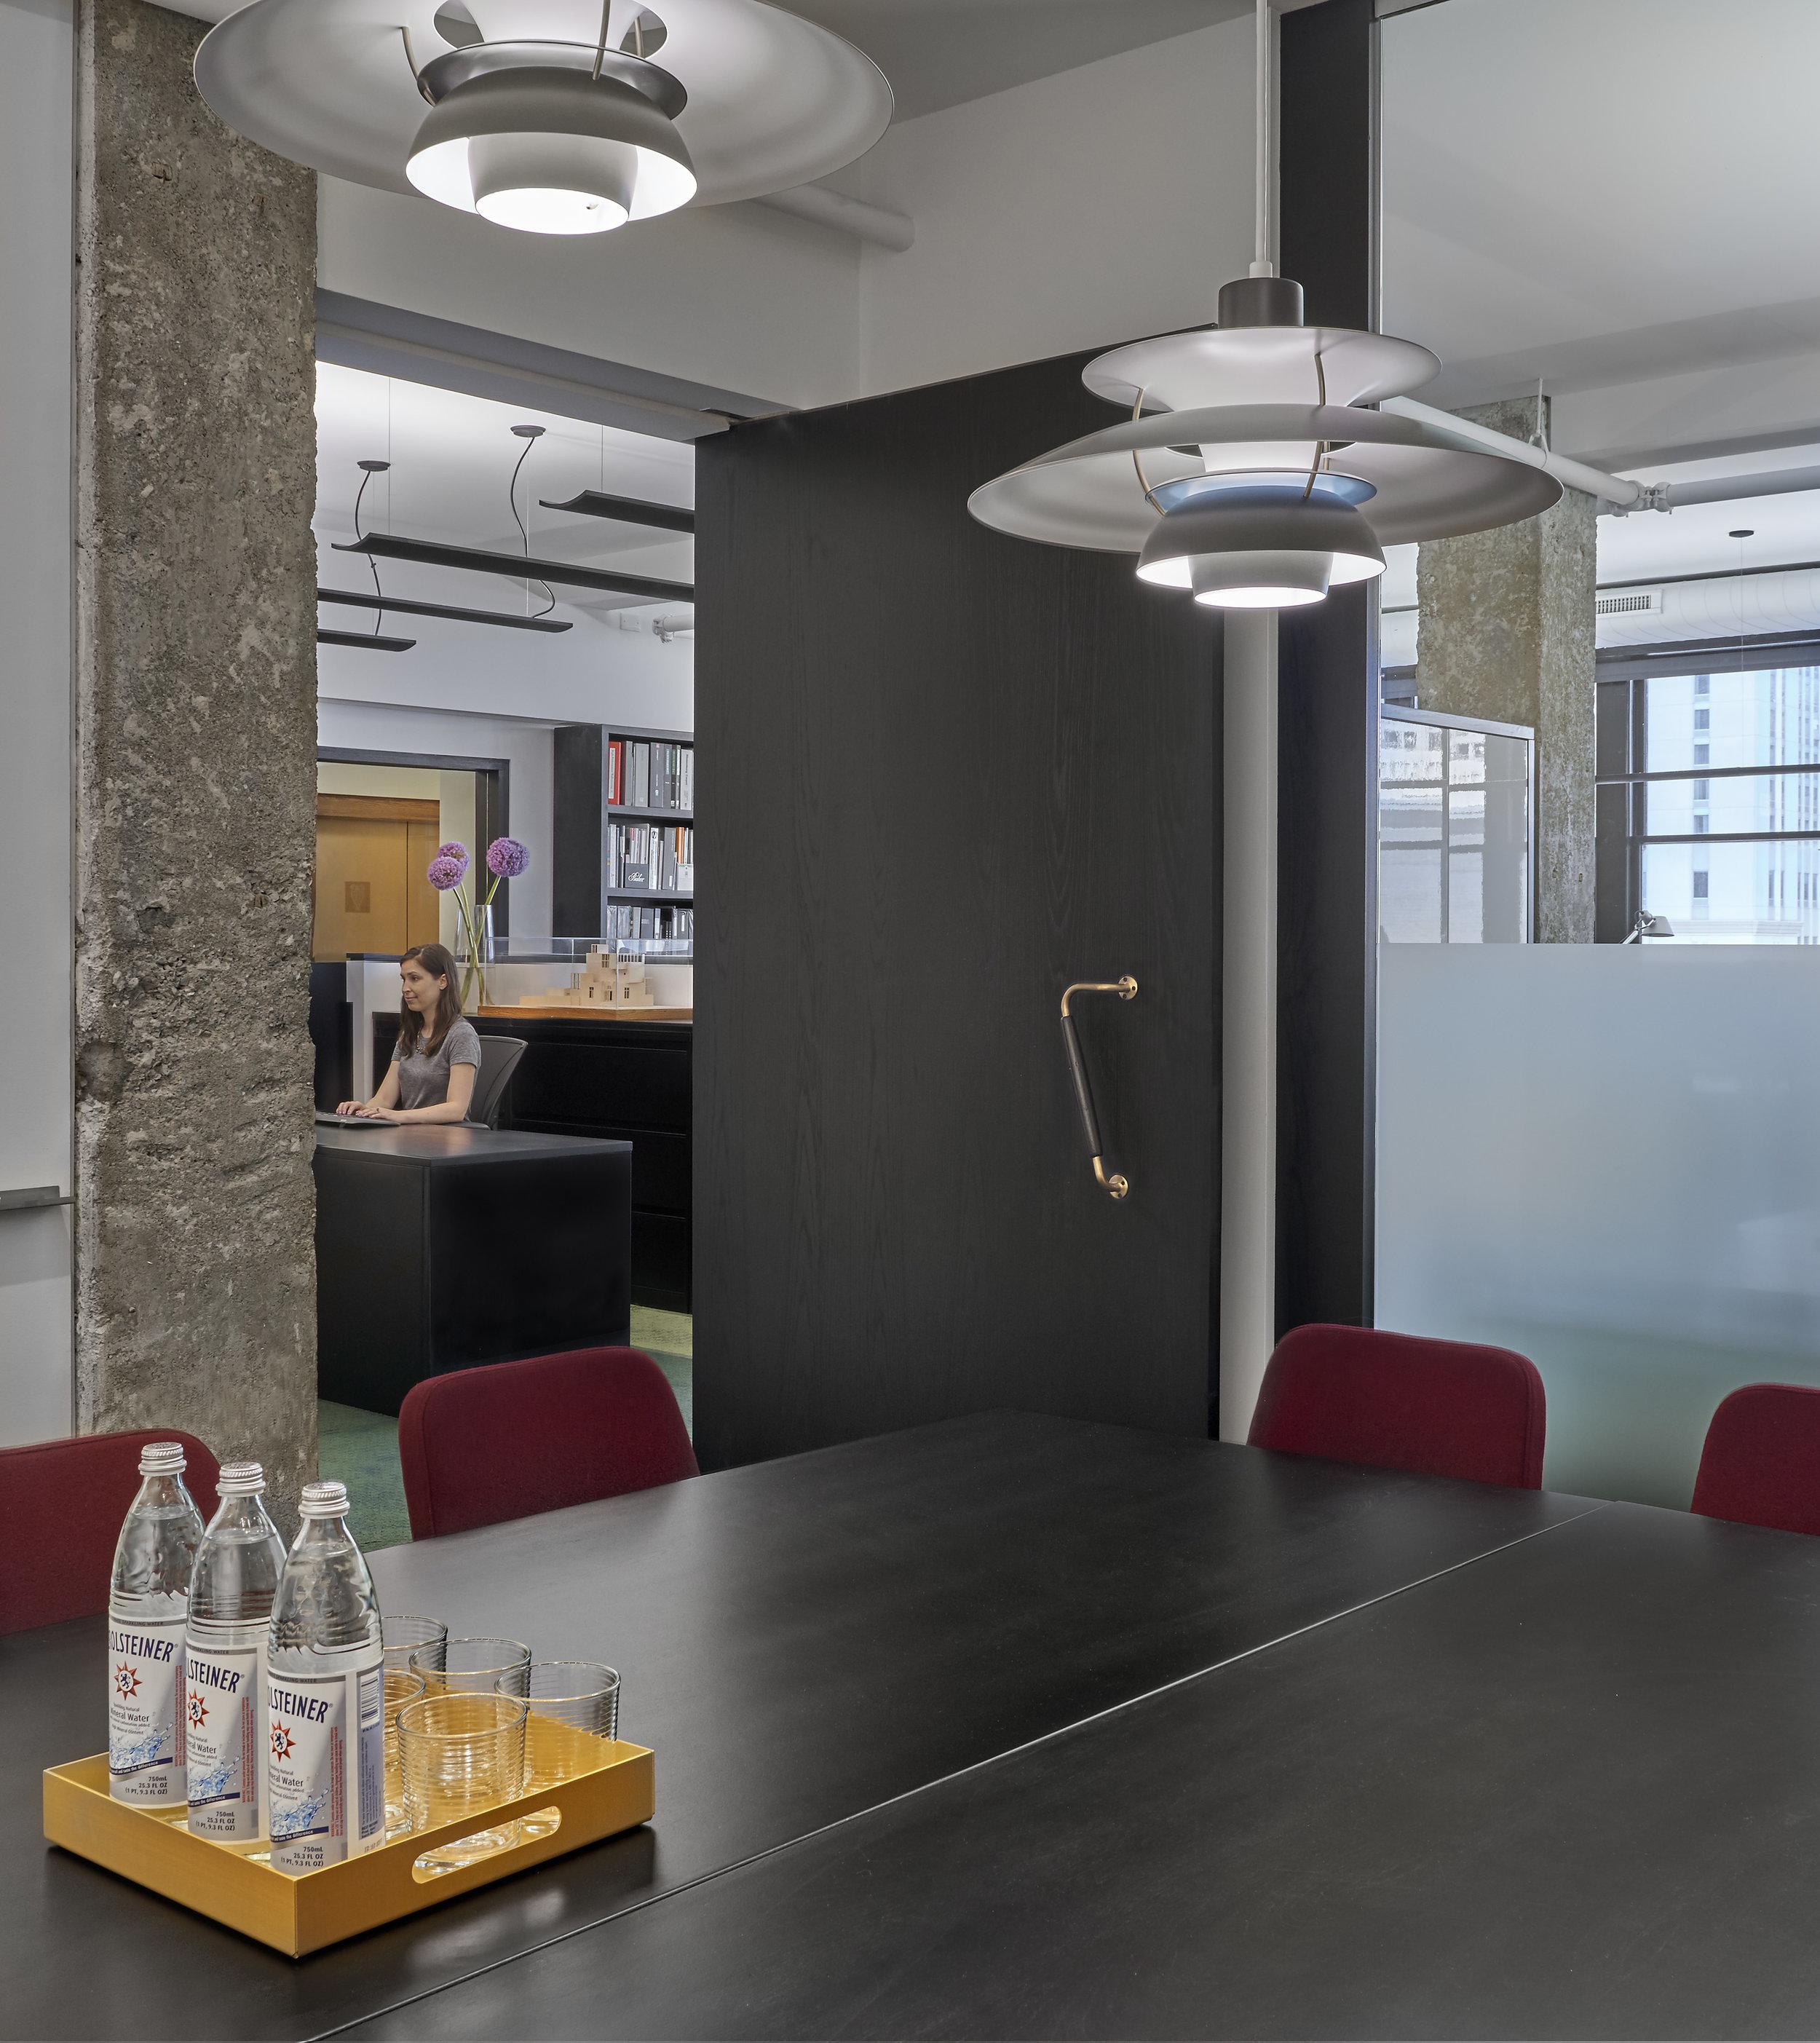 slh office_007.jpg